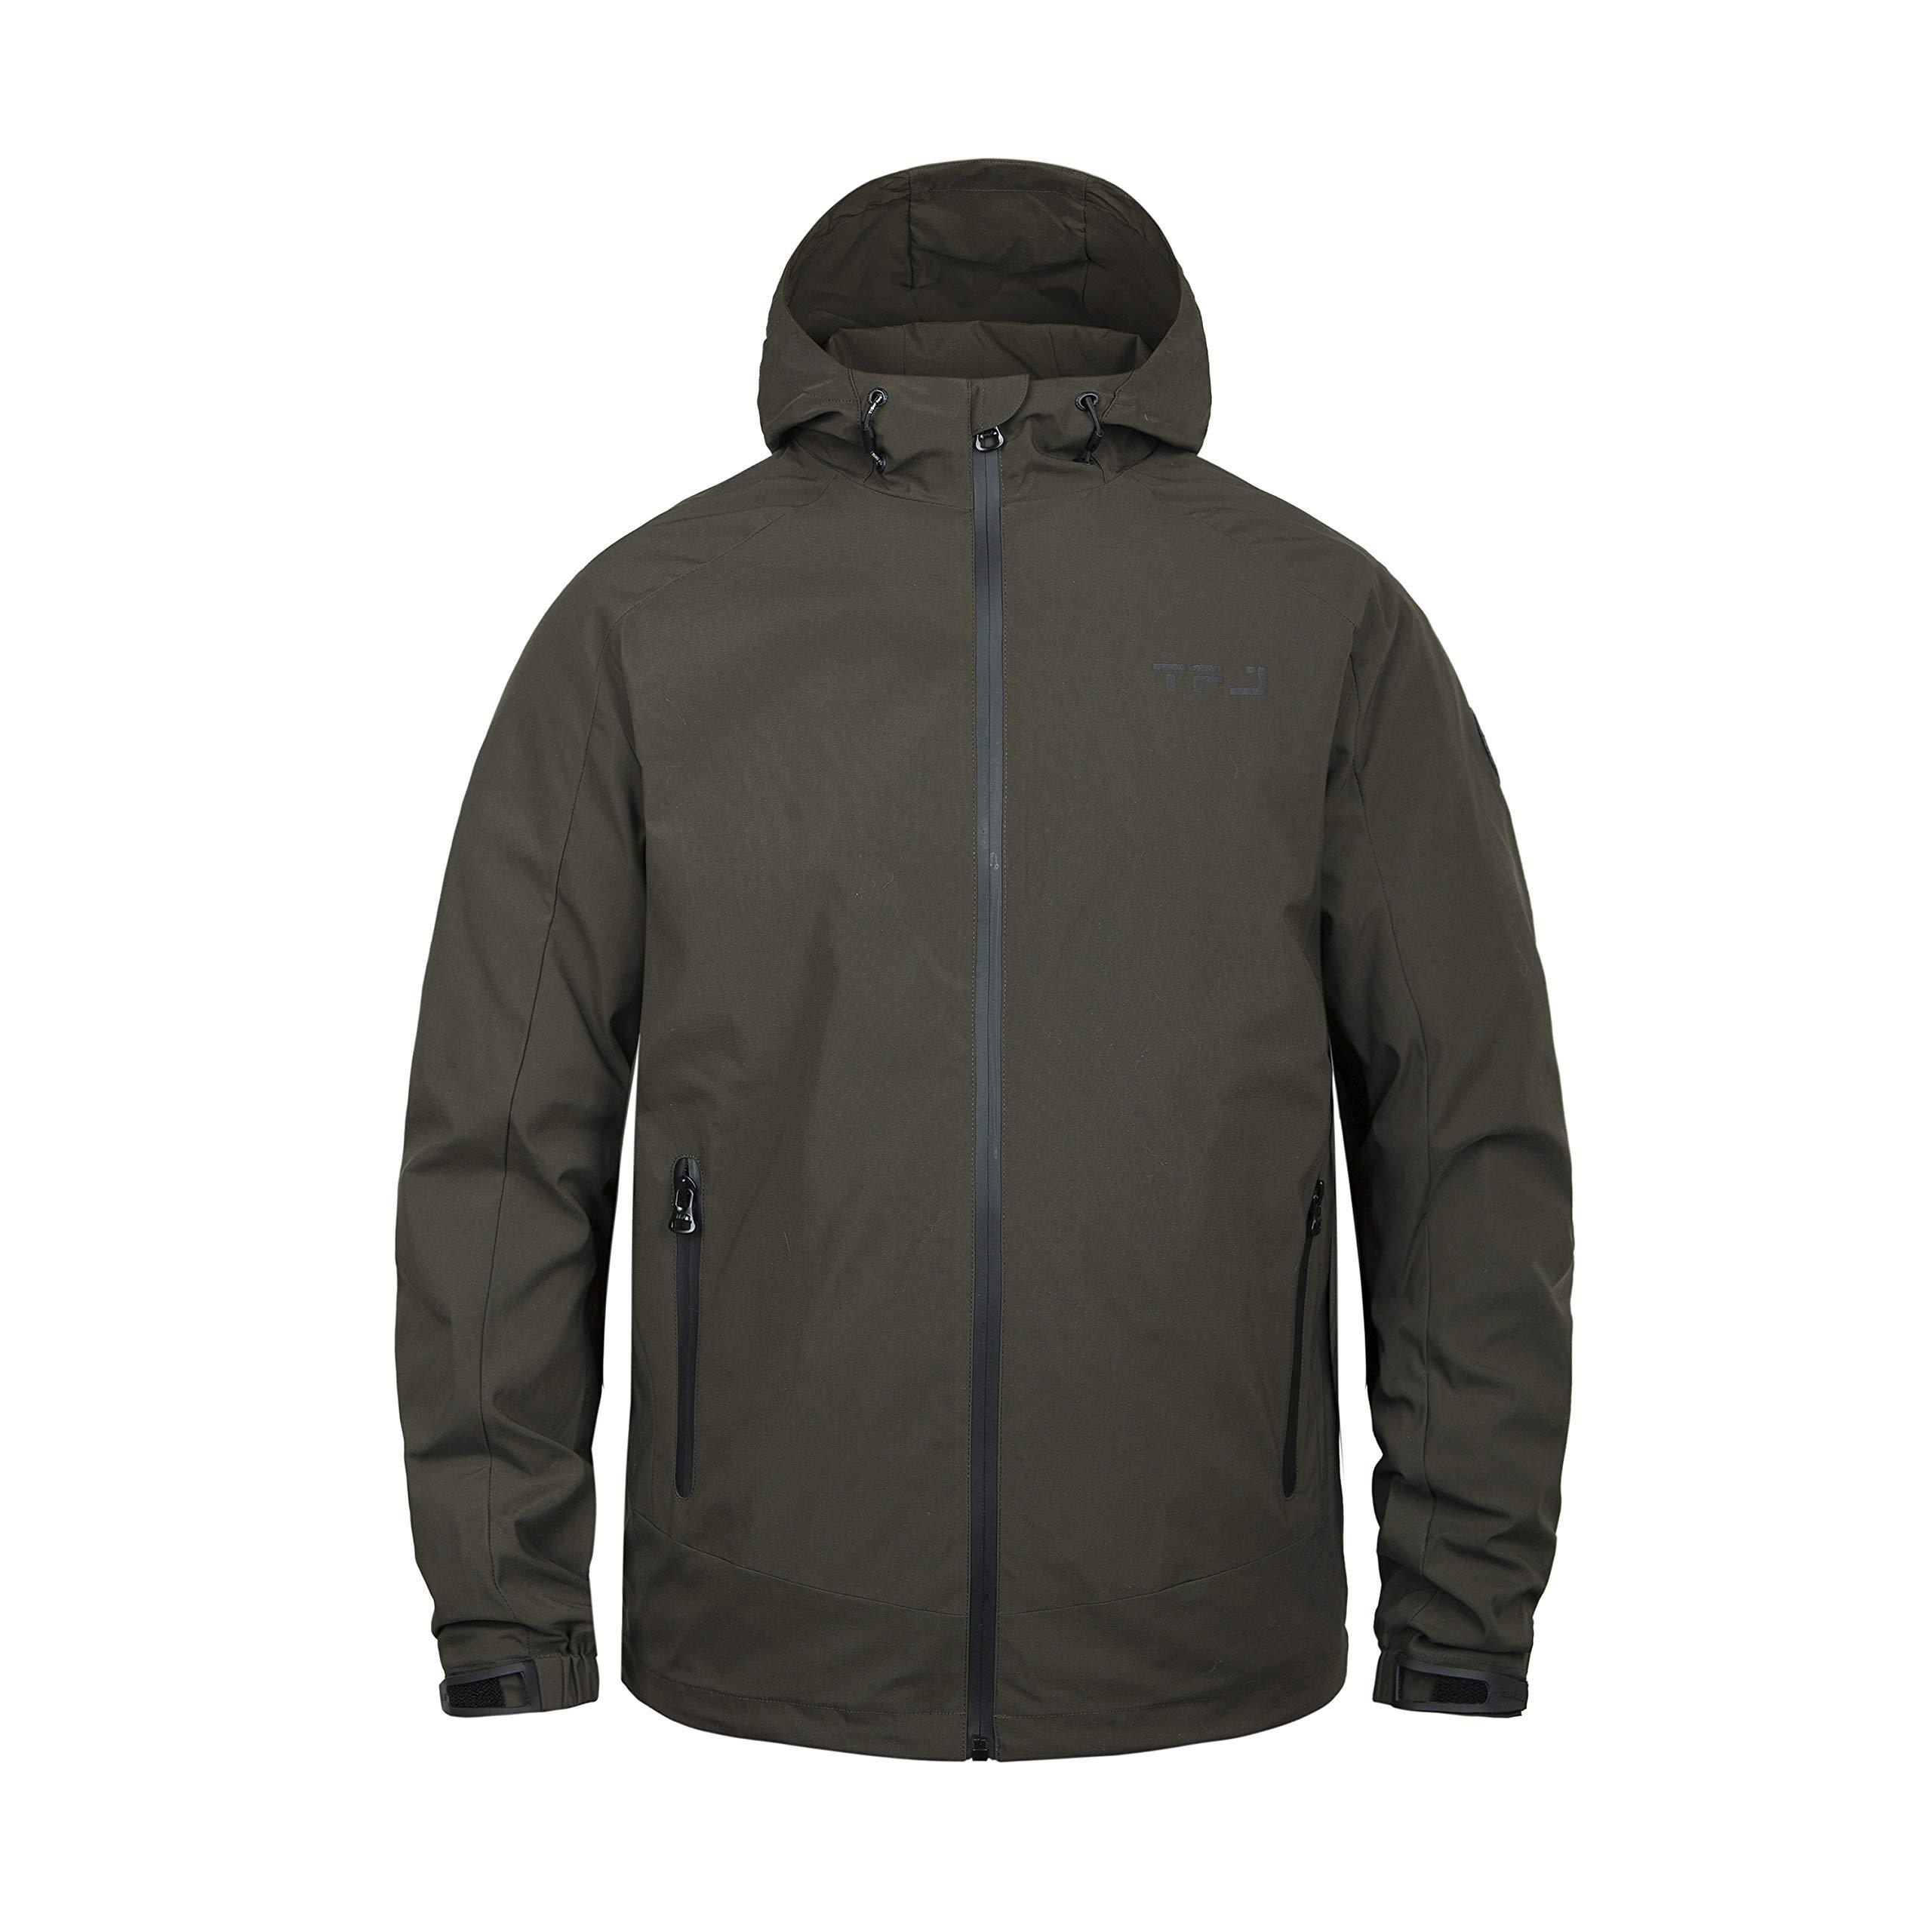 TIGER FORCE Mens Windbreaker Hooded Sweater Jacket Waterproof Running Rain Coat Active Softshell